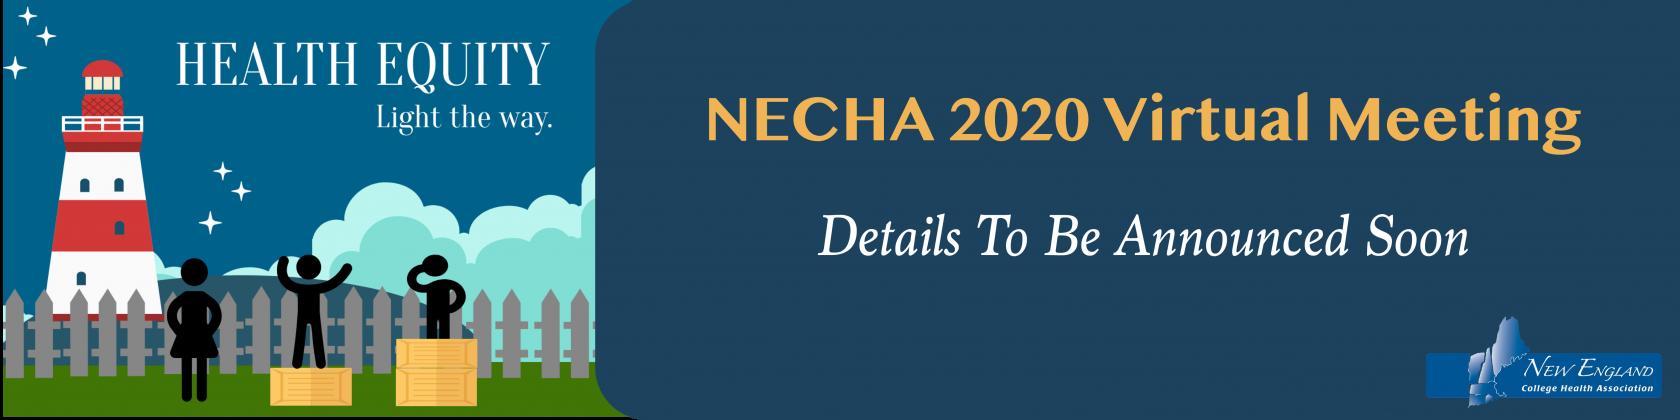 NECHA 2020 Virtual Announcement1